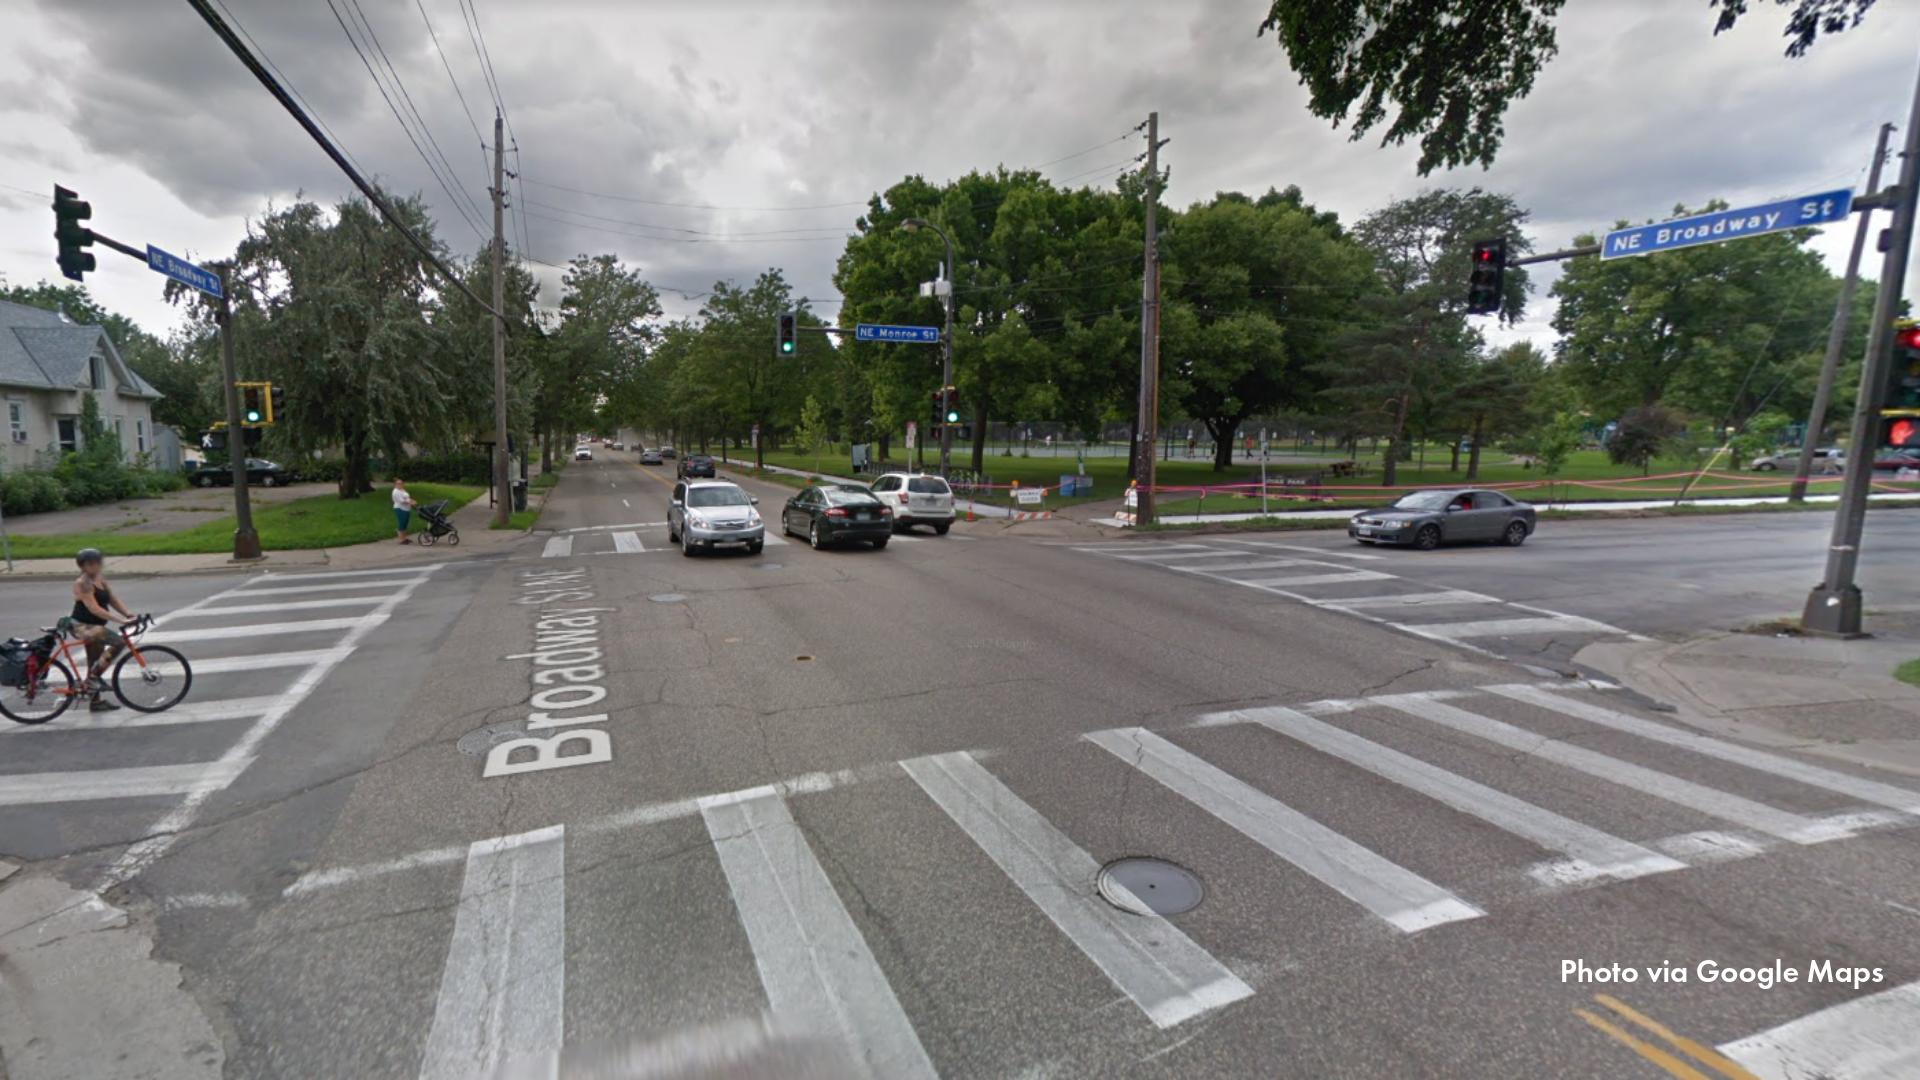 Intersection of Broadway St NE and Monroe St NE